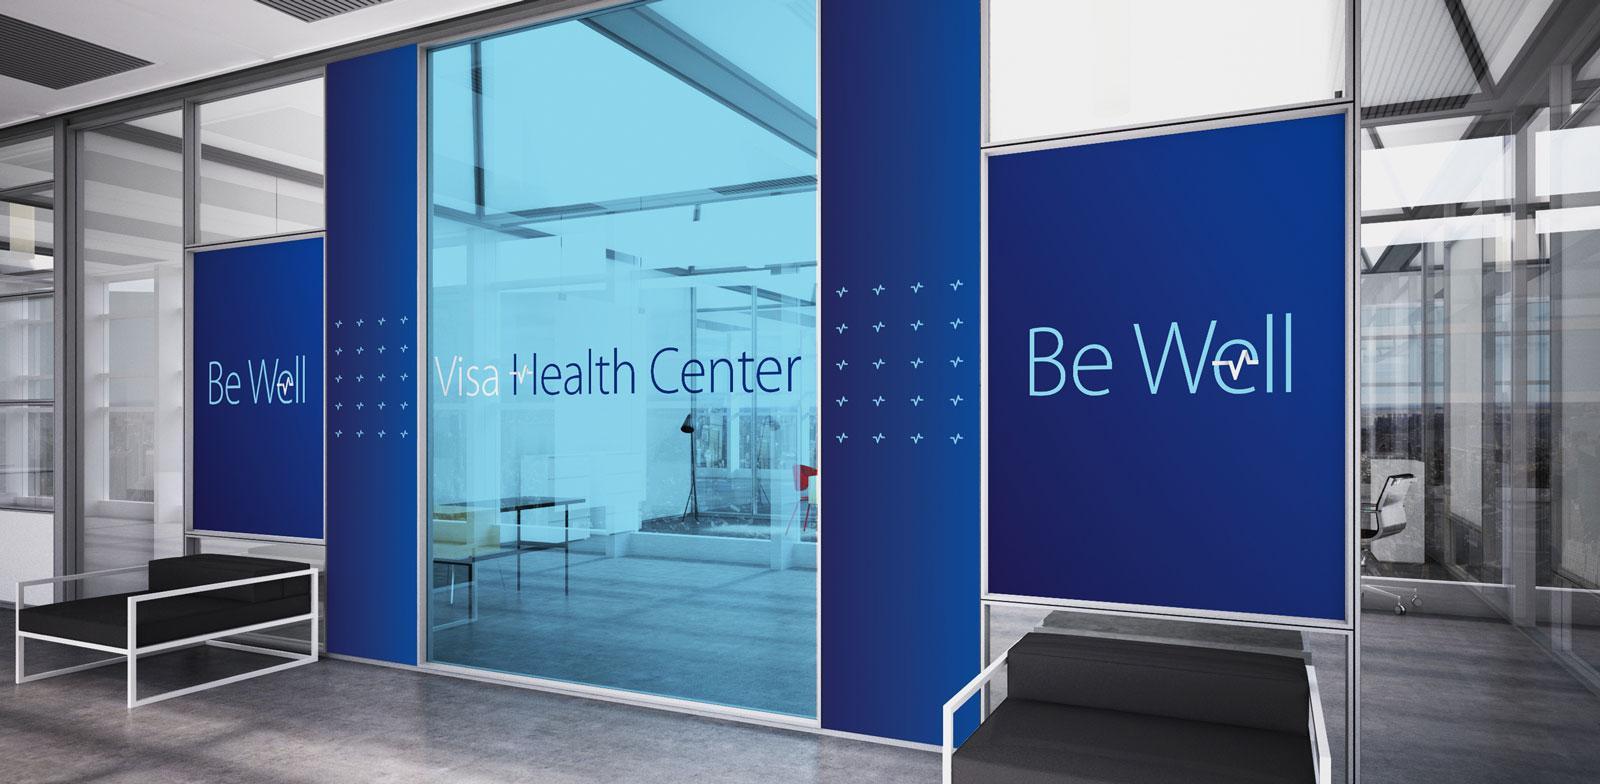 Visa Health Center - Render